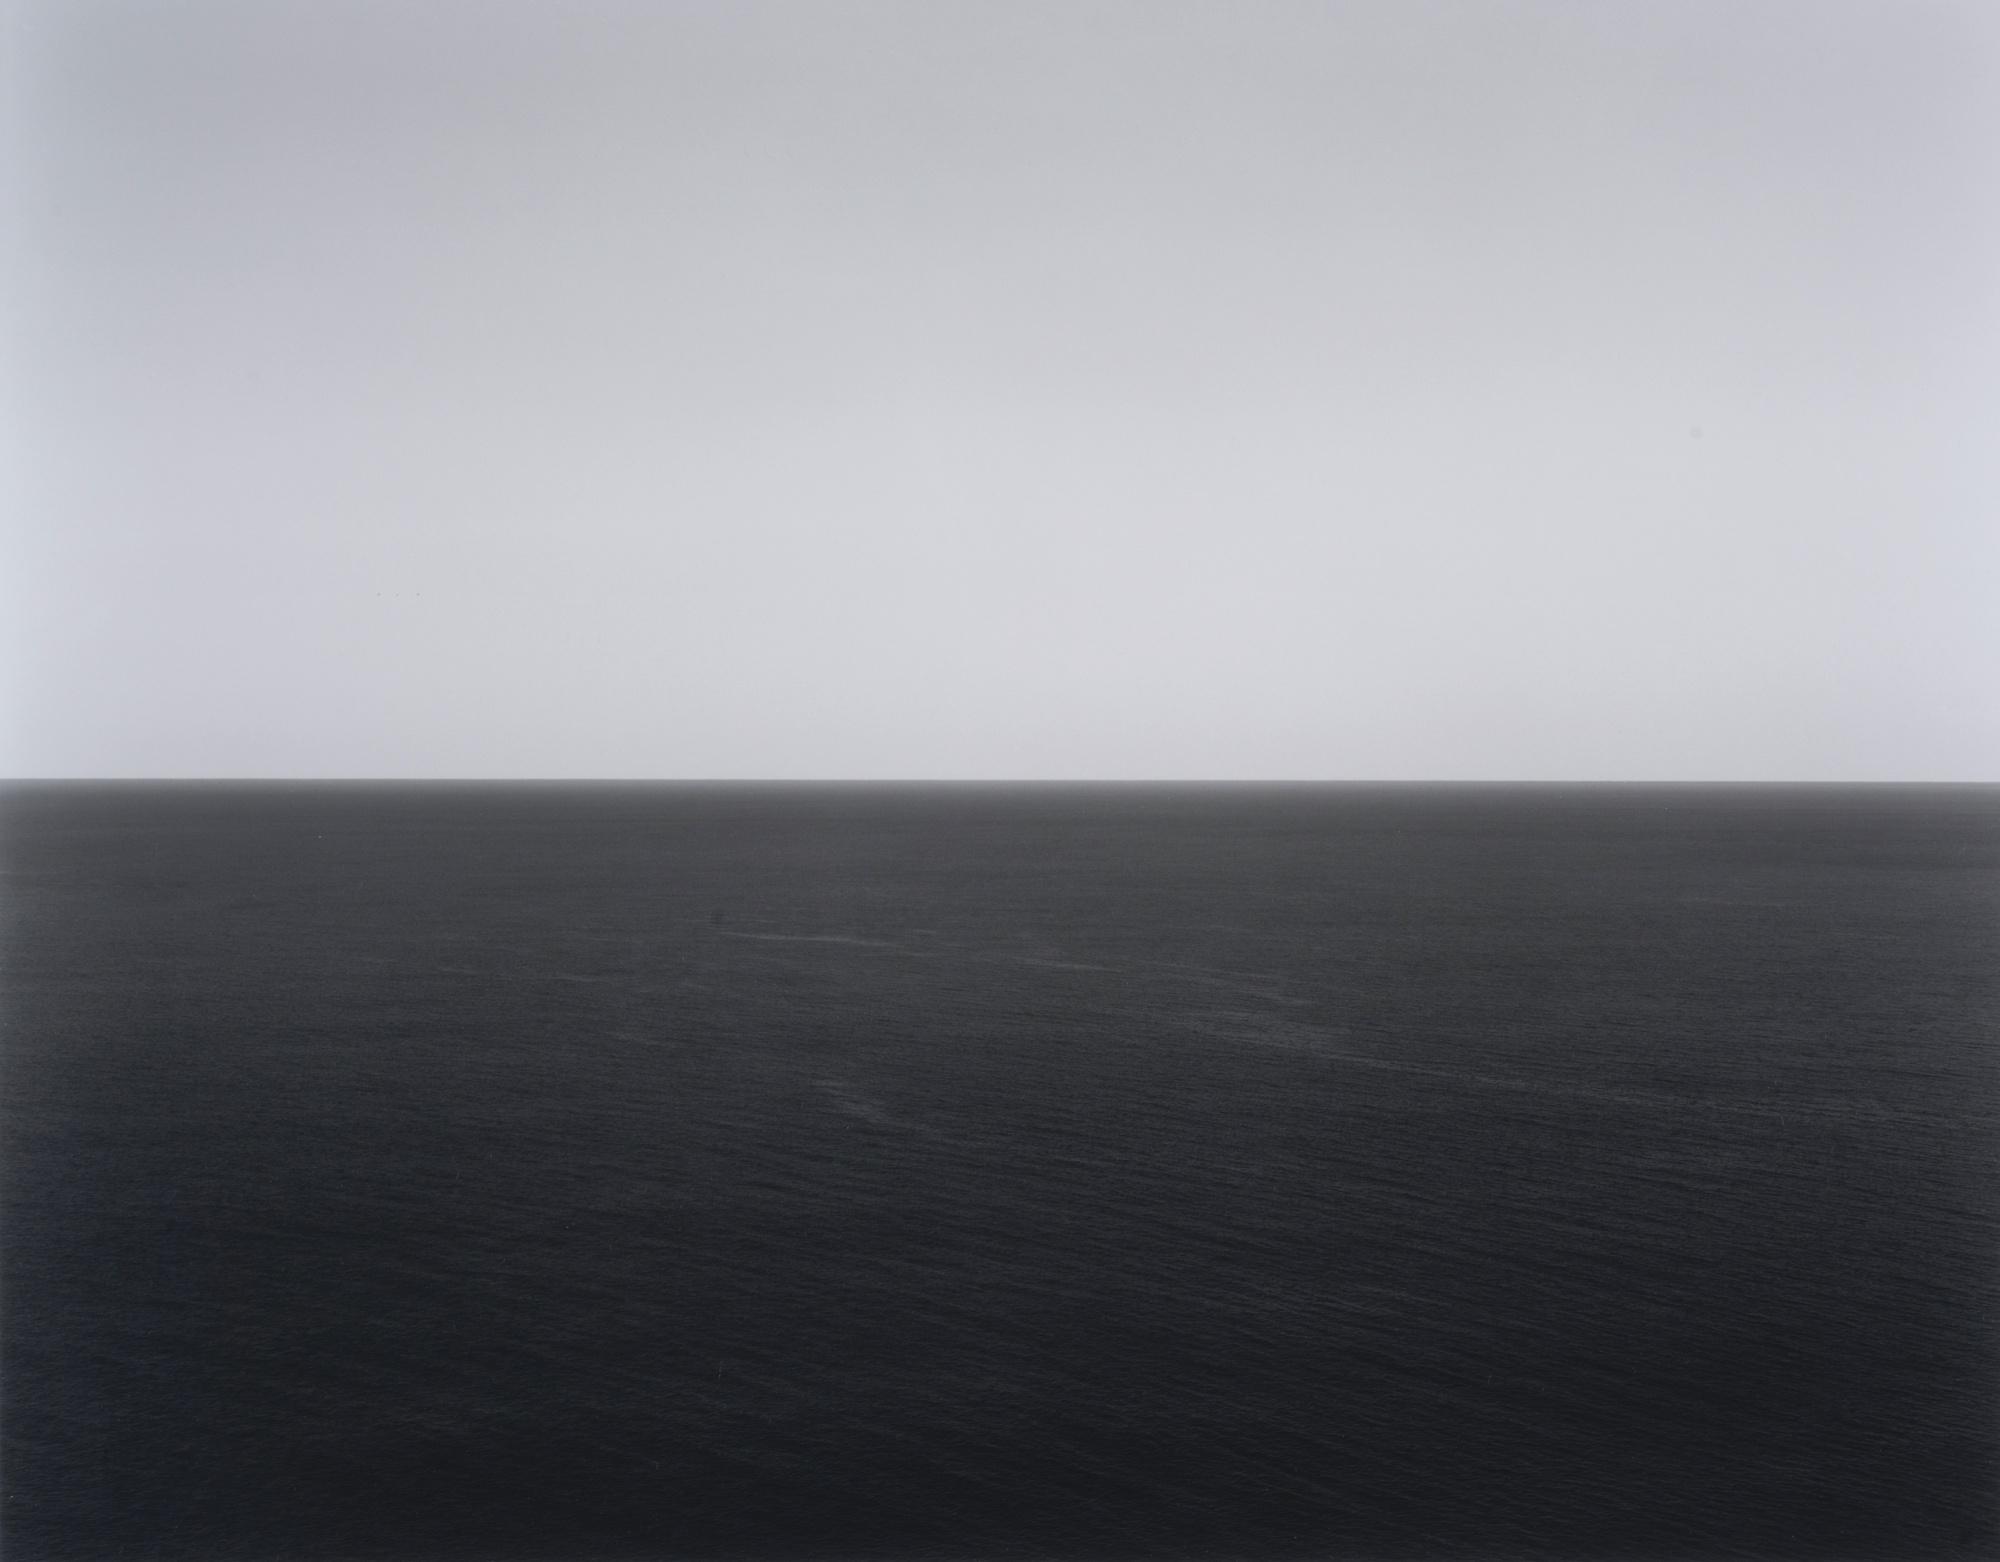 Hiroshi Sugimoto-Mediterranean Sea' Crete Ii-1990